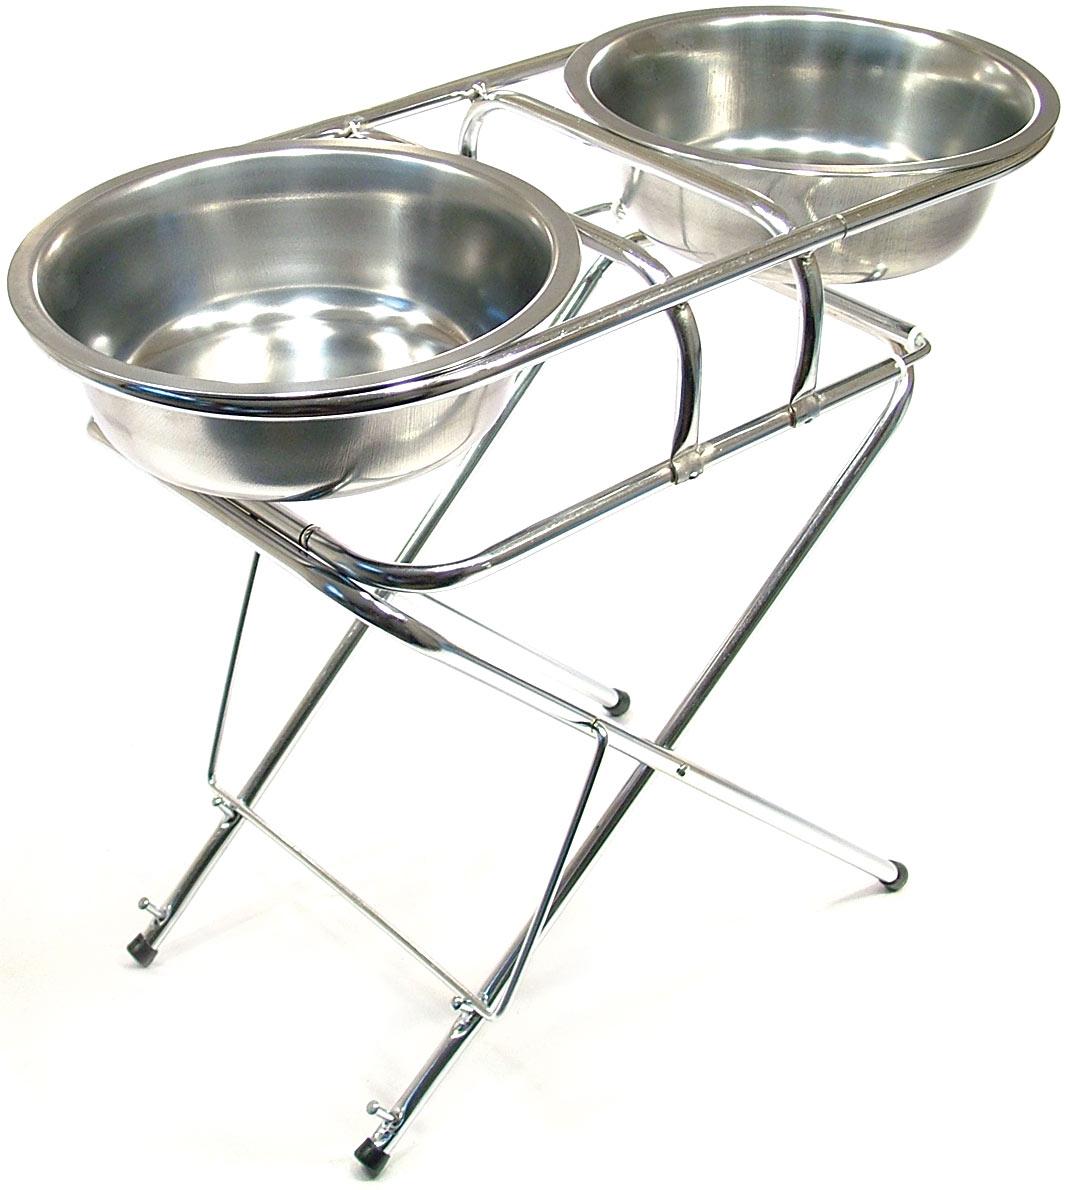 Raised Feeding Bowls For Dogs Uk